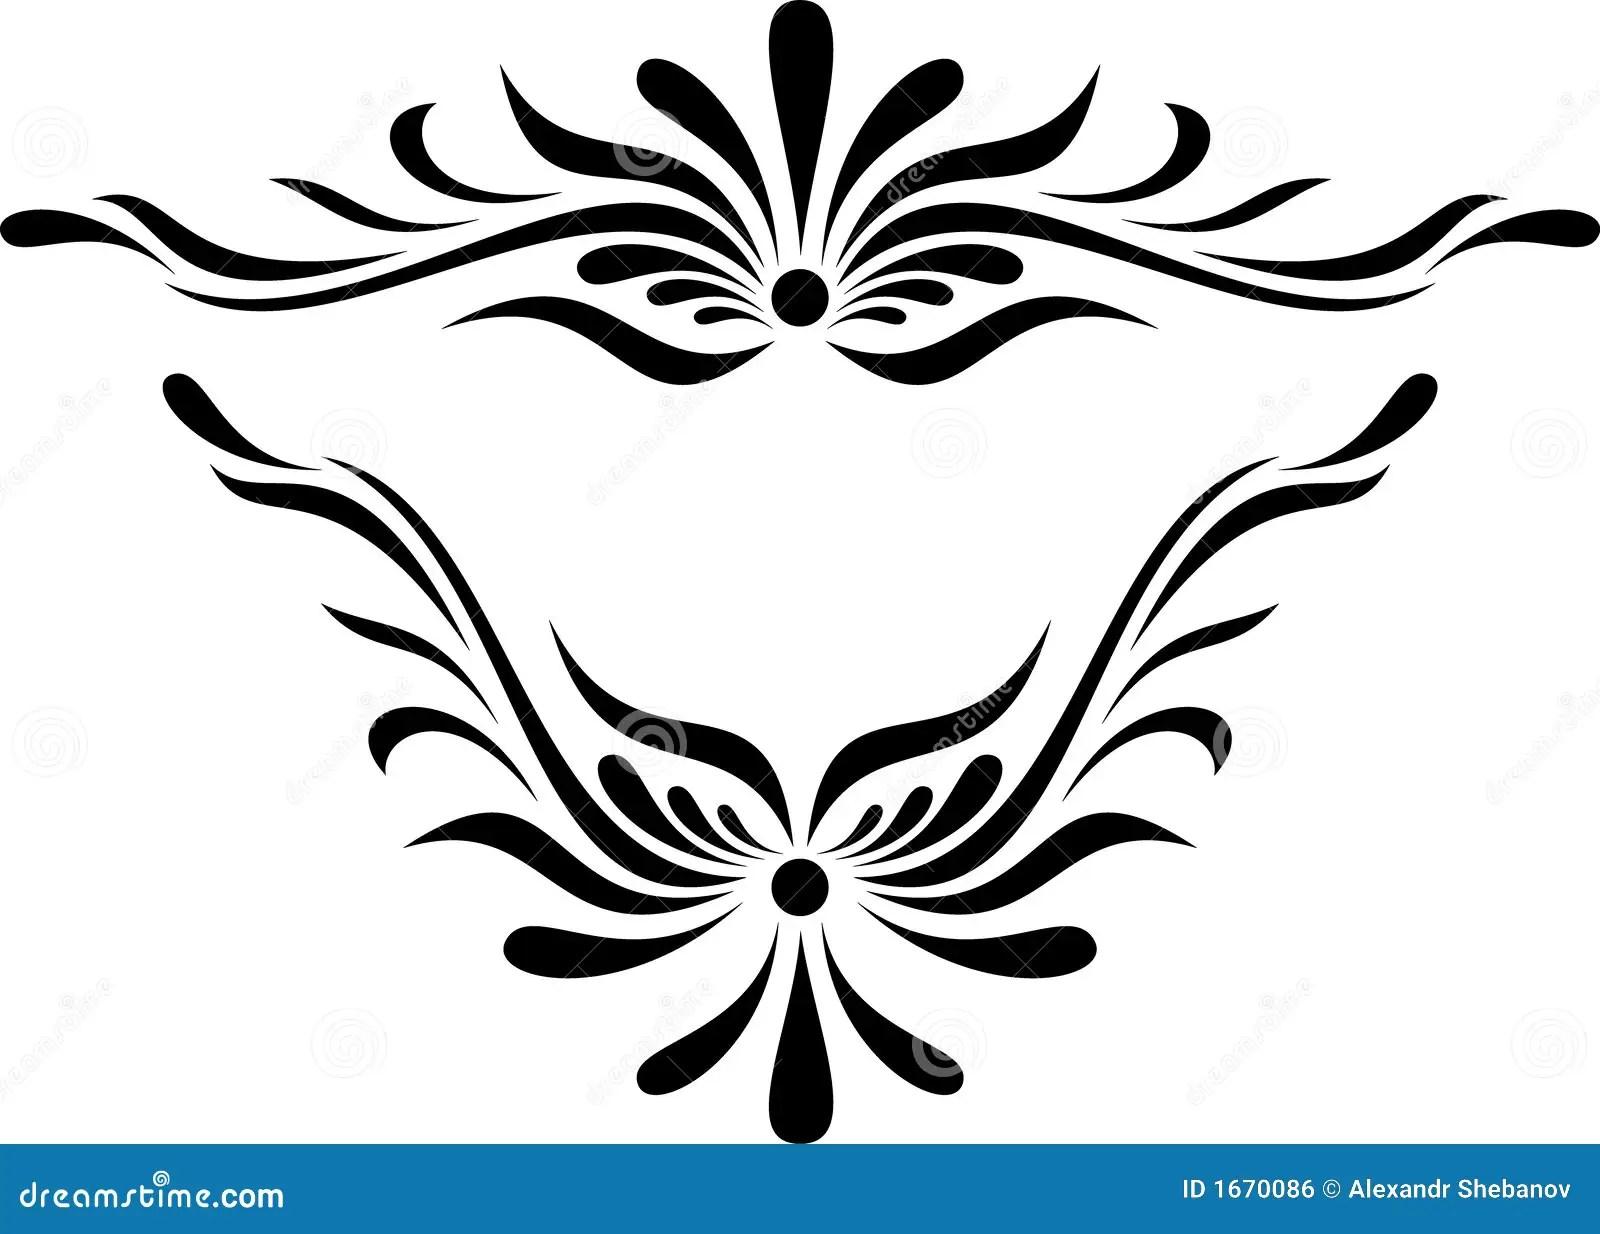 Scroll Design Stock Vector Illustration Of Angle Fantasy